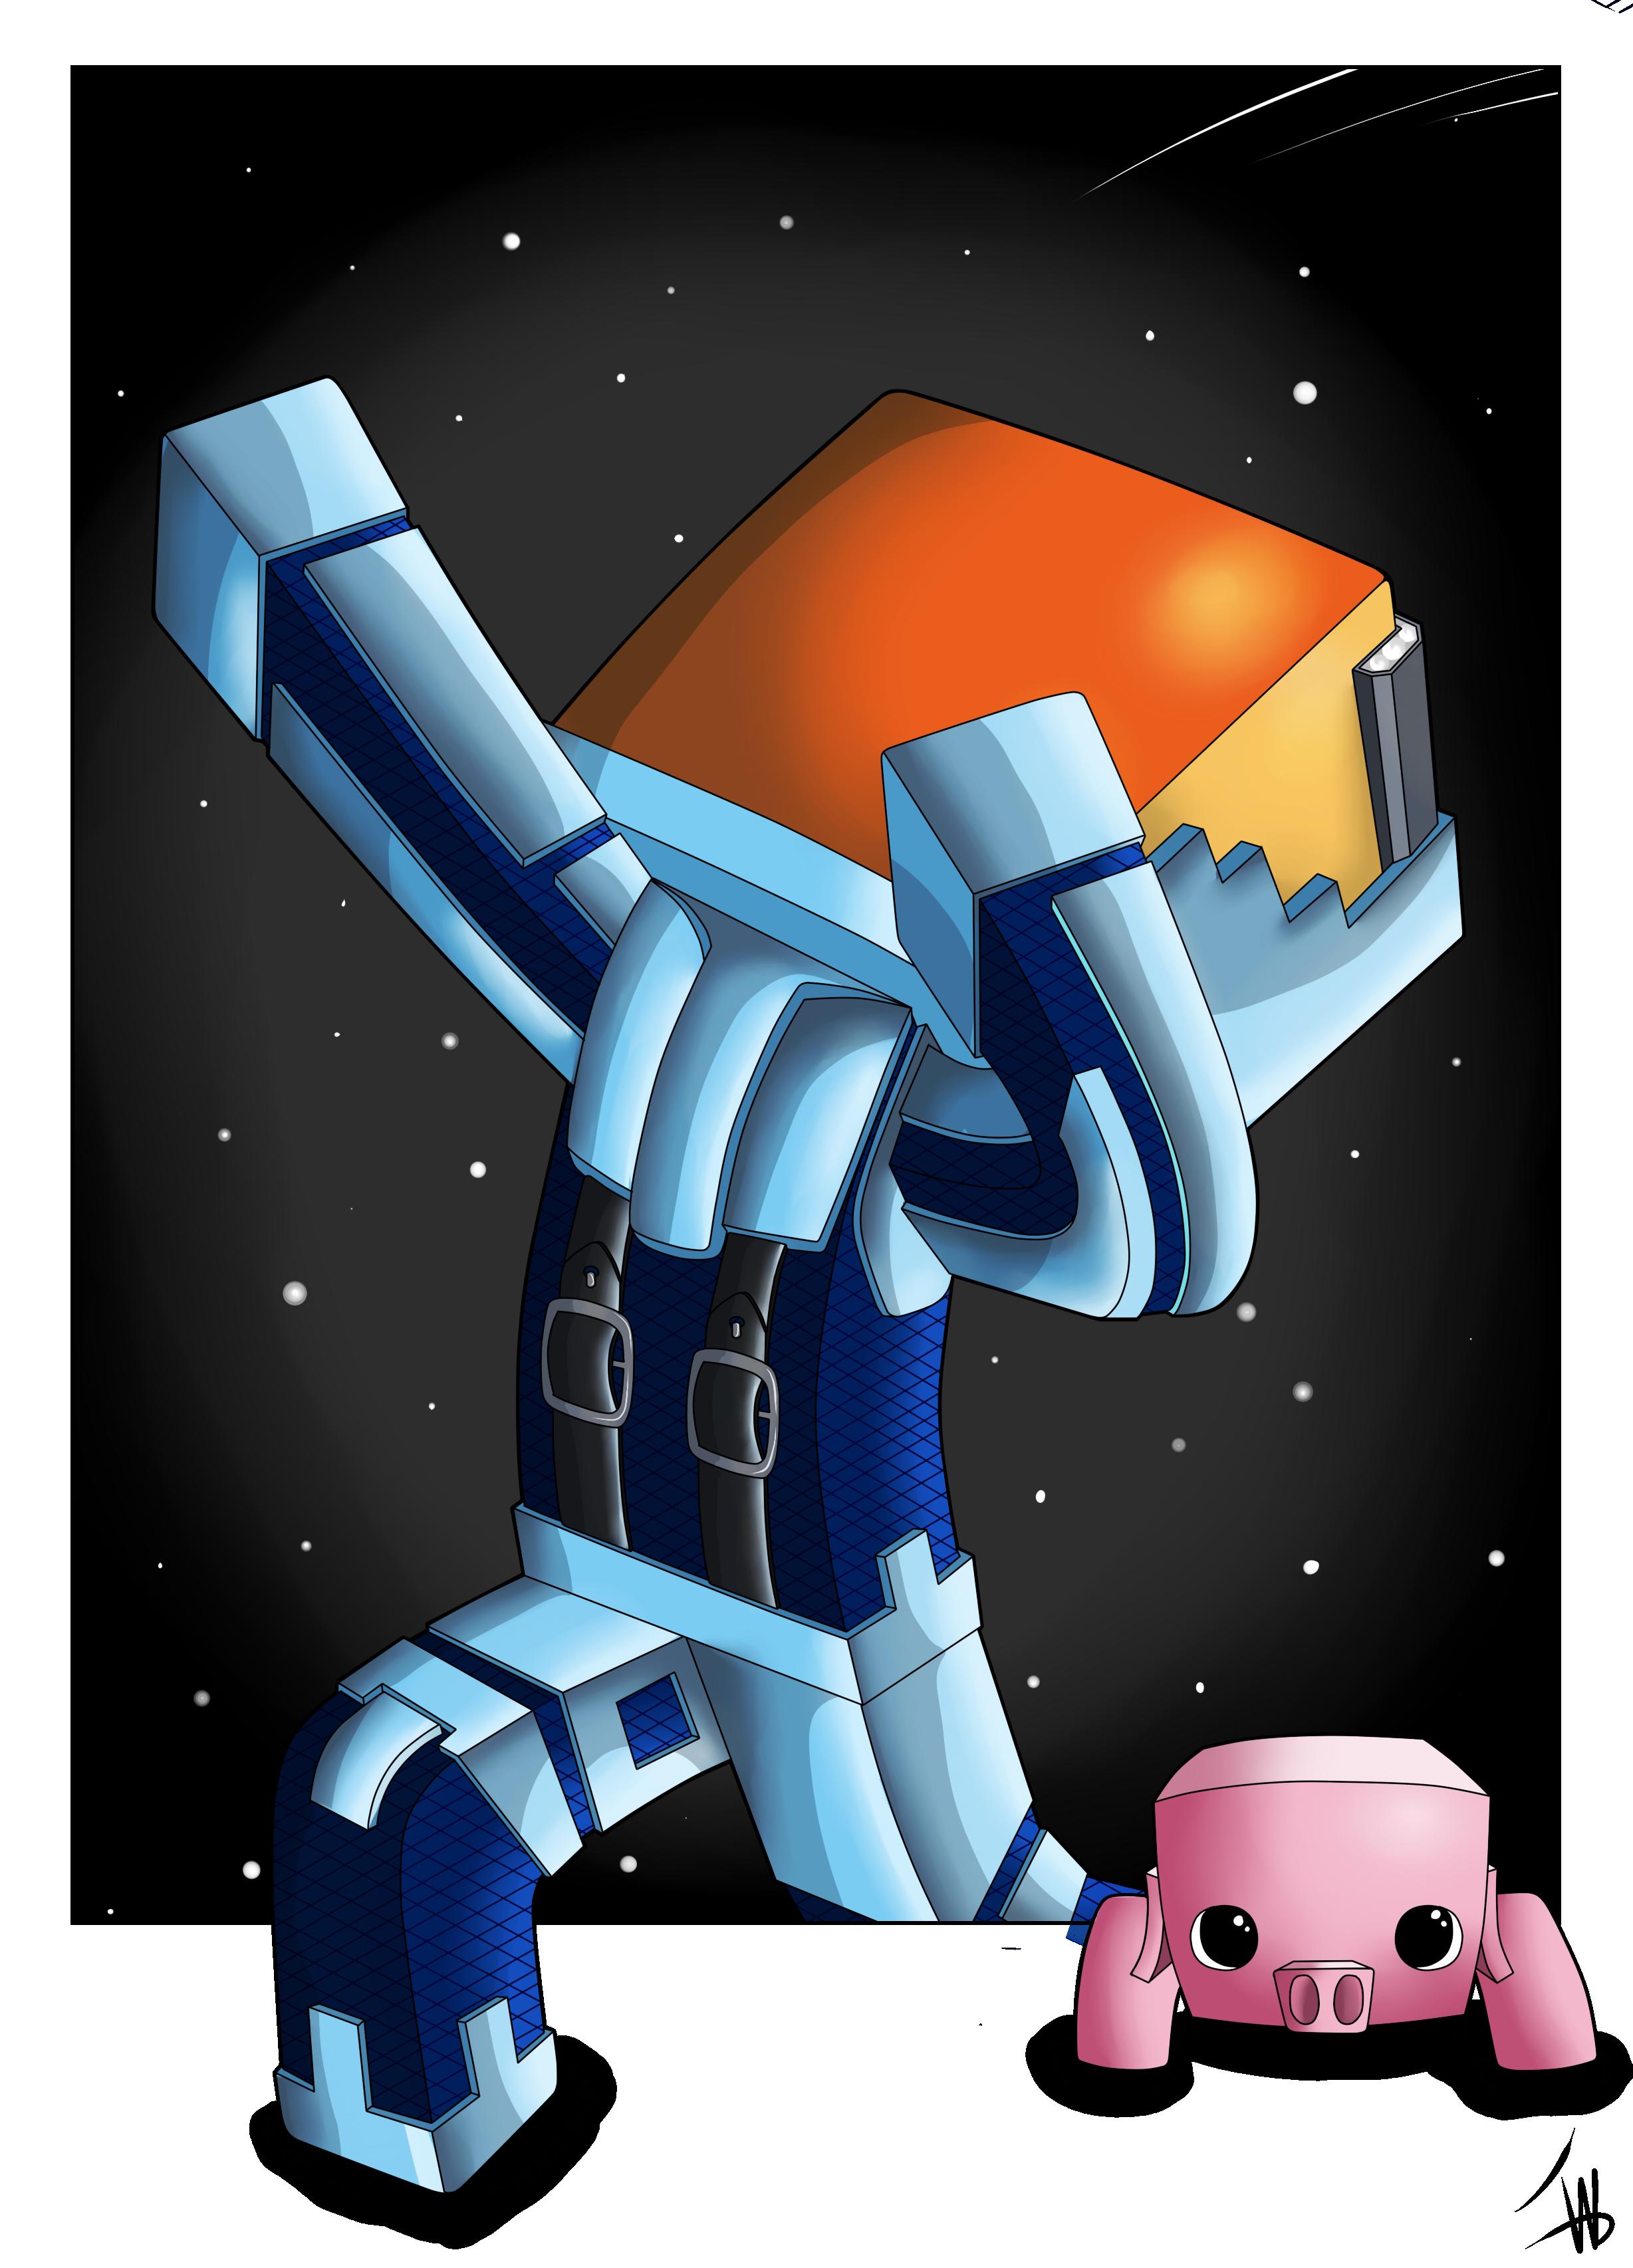 Minecraft Universe by IshmanAllenLitchmore on DeviantArt DHLX0nRp